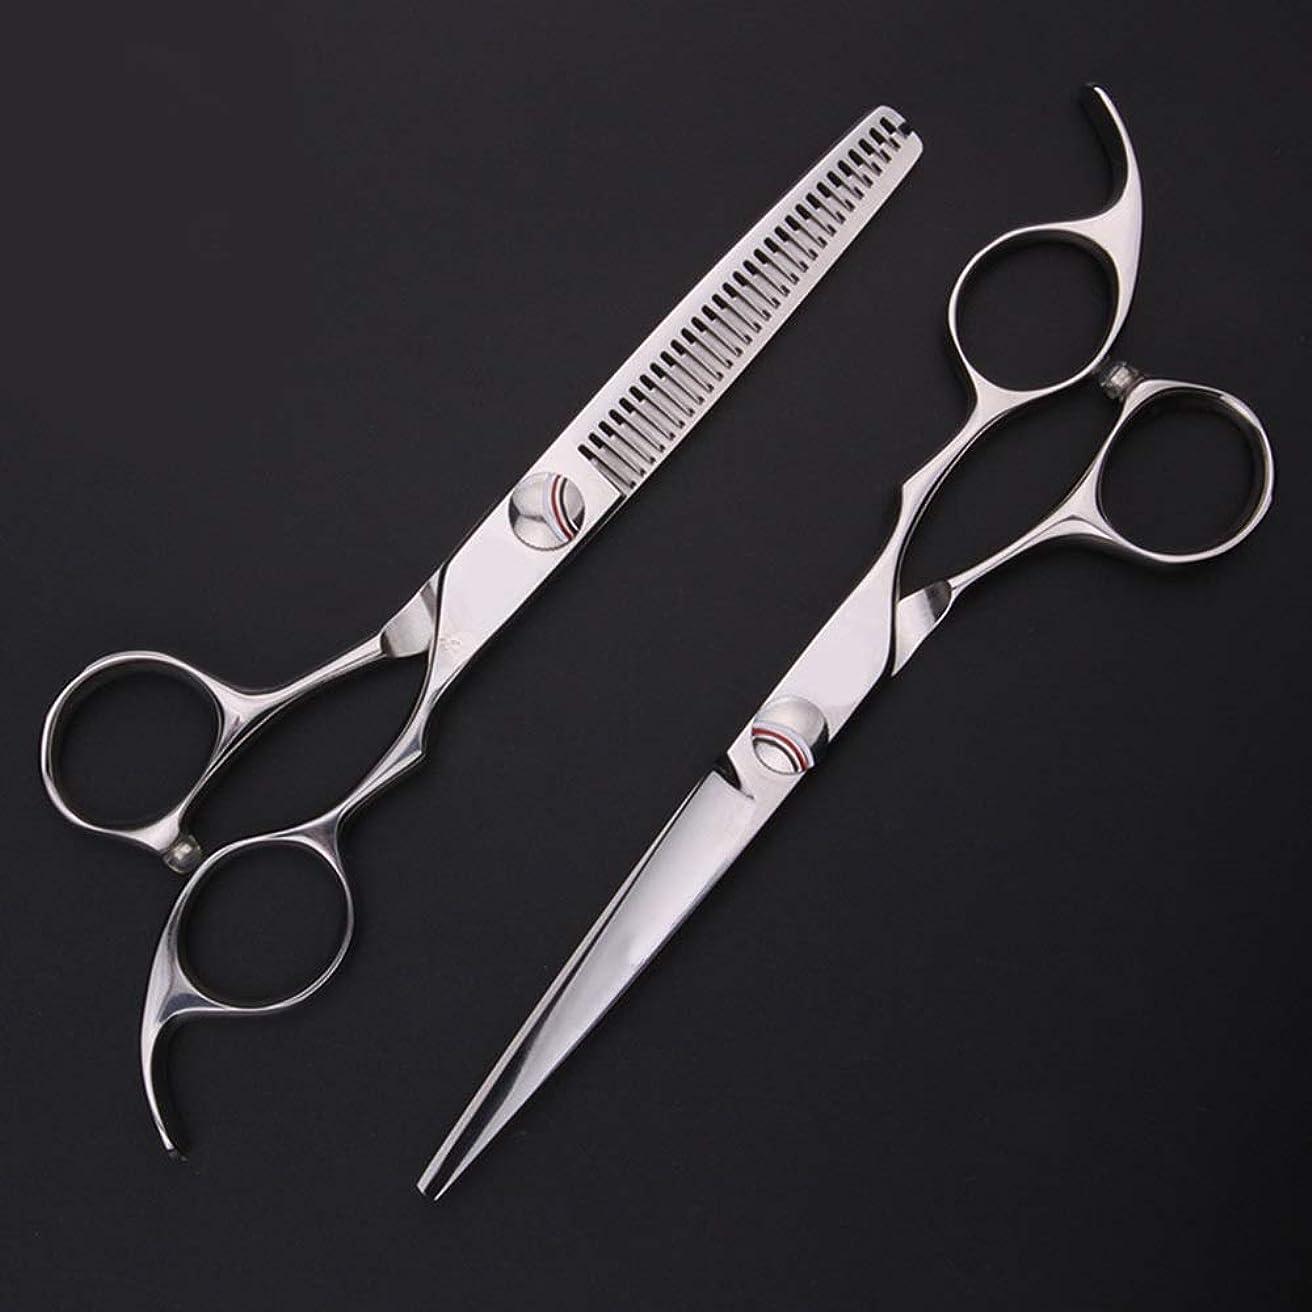 MengY 新しい440 Cプロフェッショナル理髪はさみ、6インチ理髪はさみセット指残り (色 : Silver)